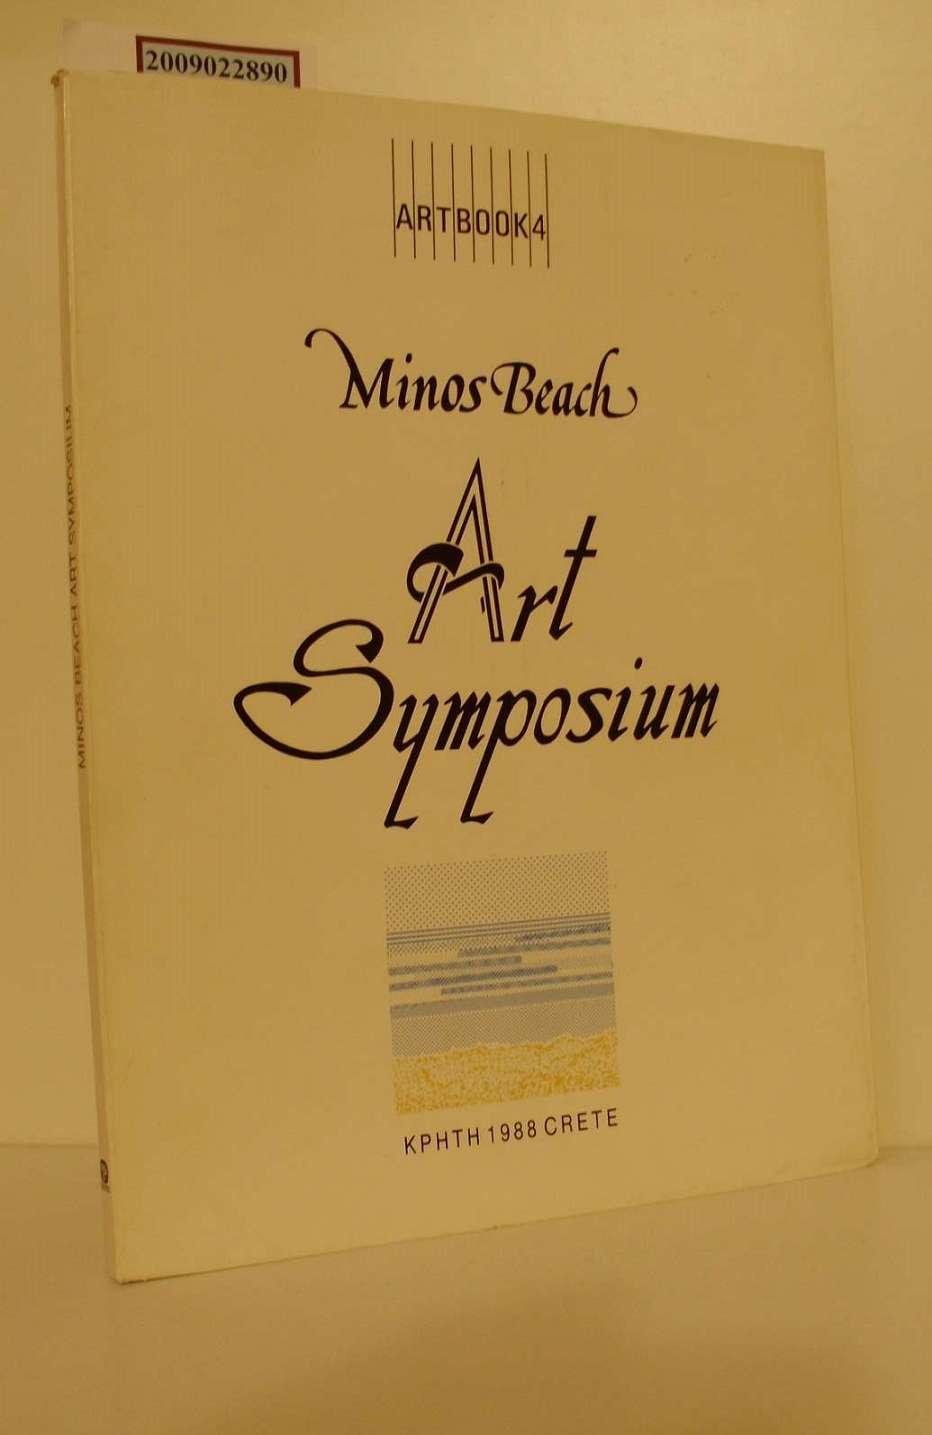 Artbook 4 Minos Beach Art Symposium 3000 Exemplare